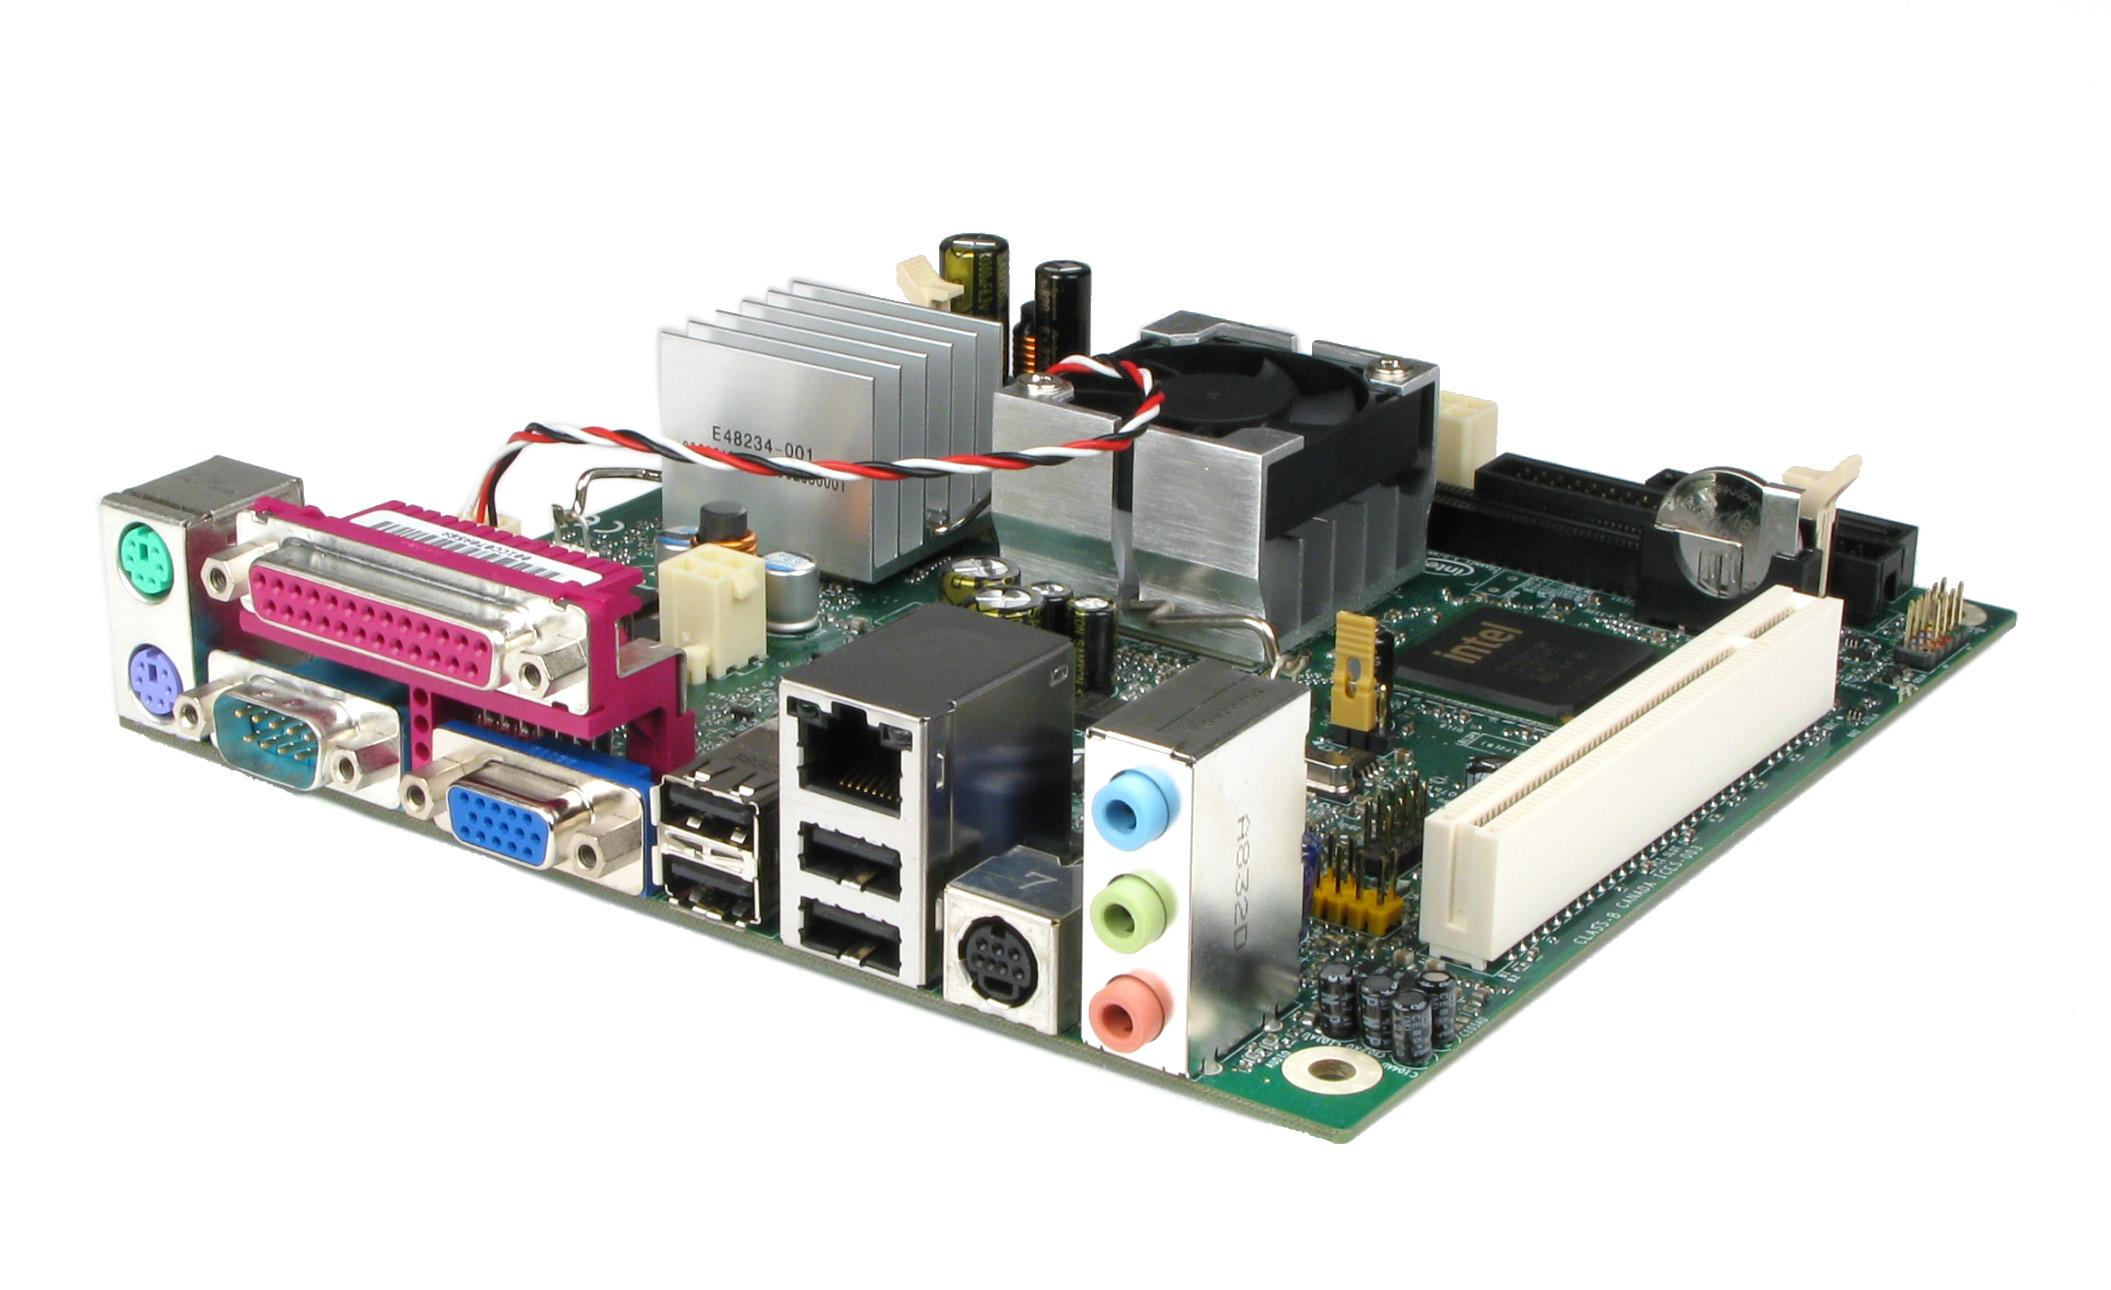 Intel's D945GCLF2 Little Falls 2: The DiAtomic Mainboard